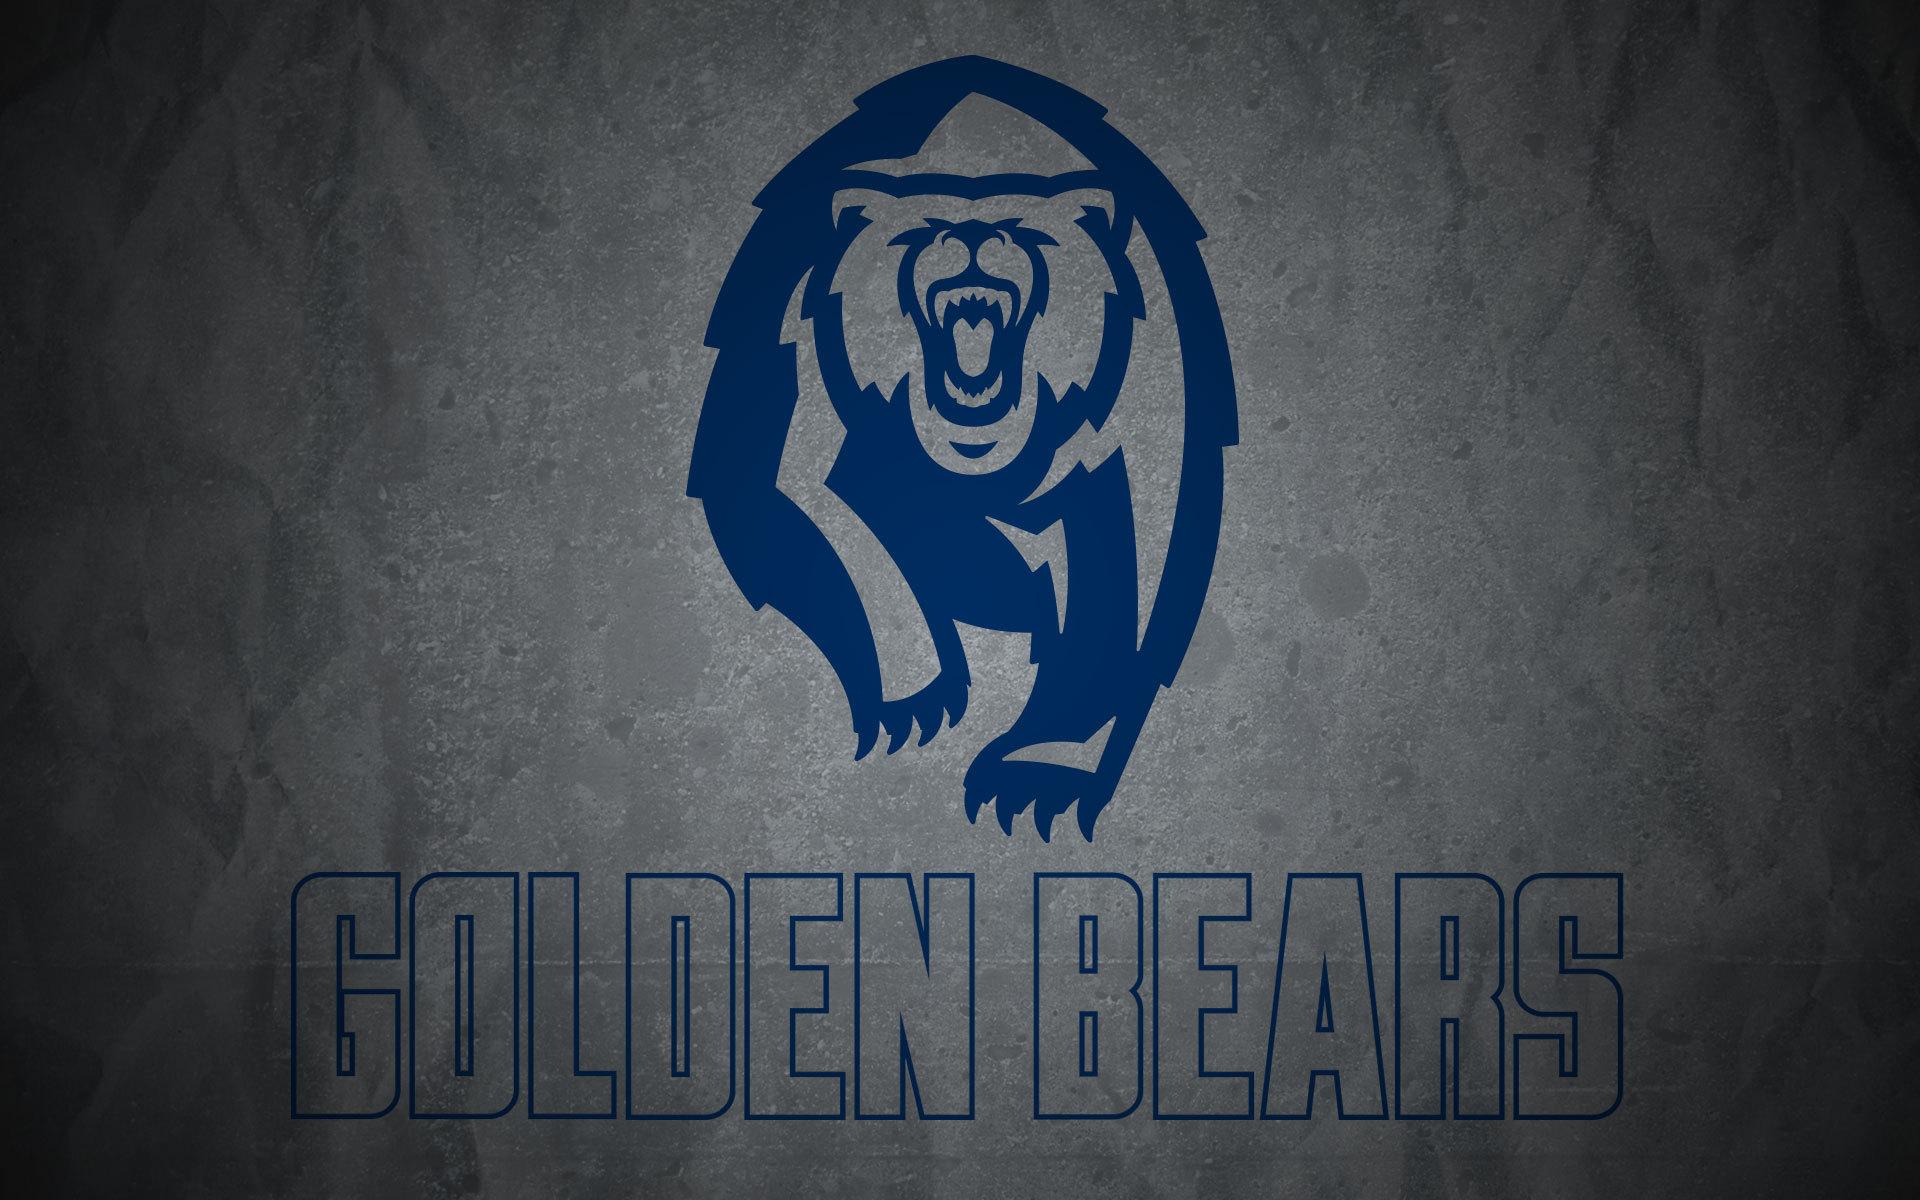 Cal bears wallpaper